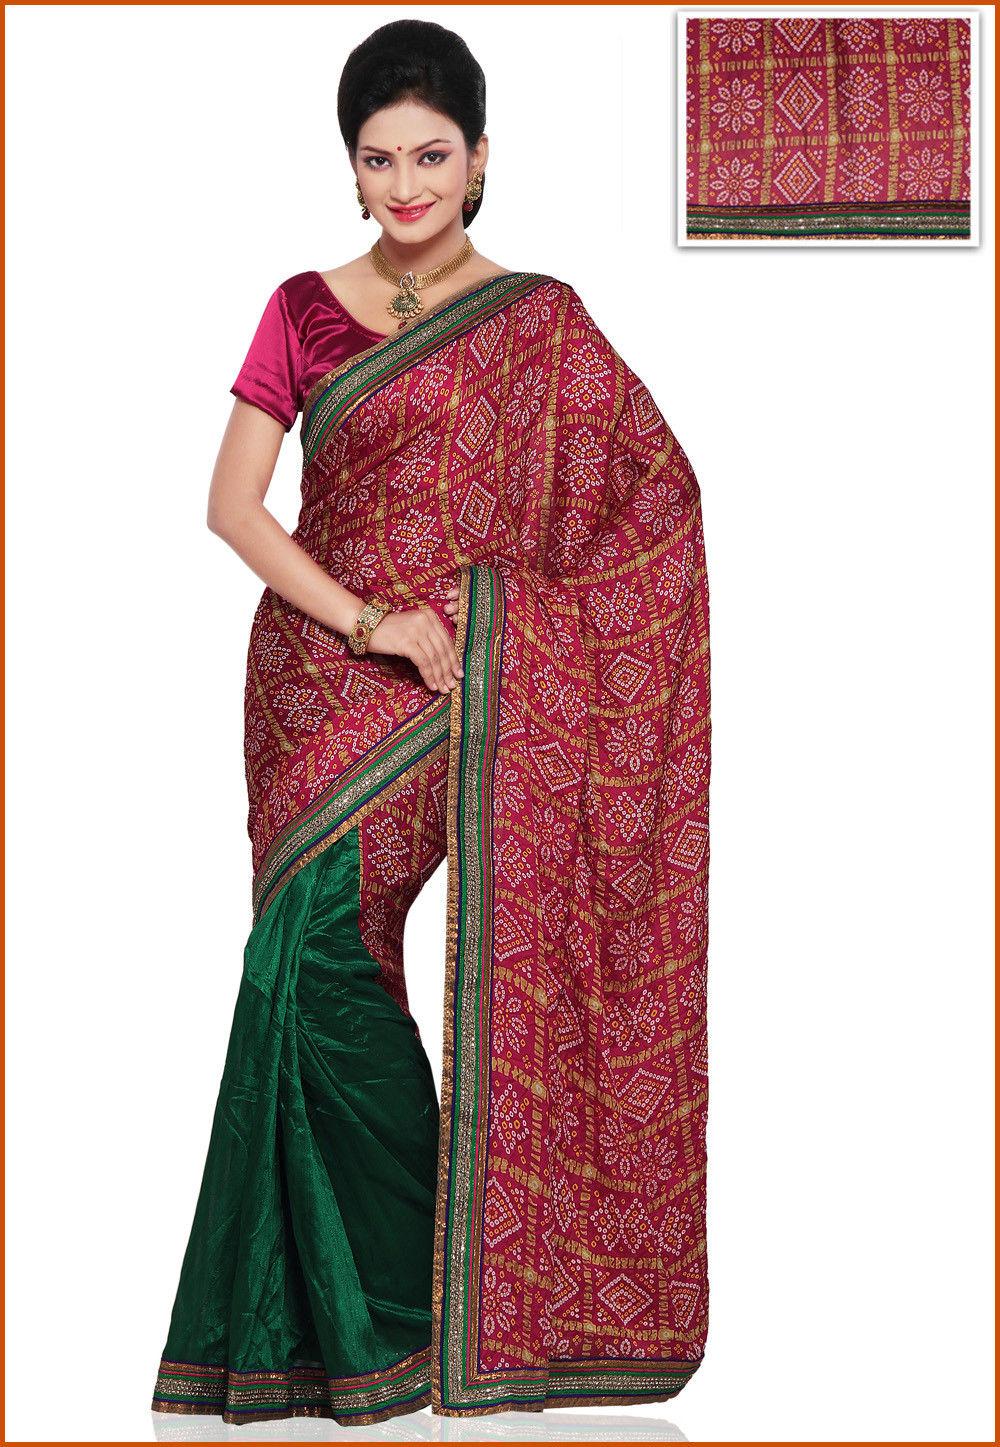 Printed Half N Half Crepe and Bhagalpuri Silk Saree in Magenta and Green